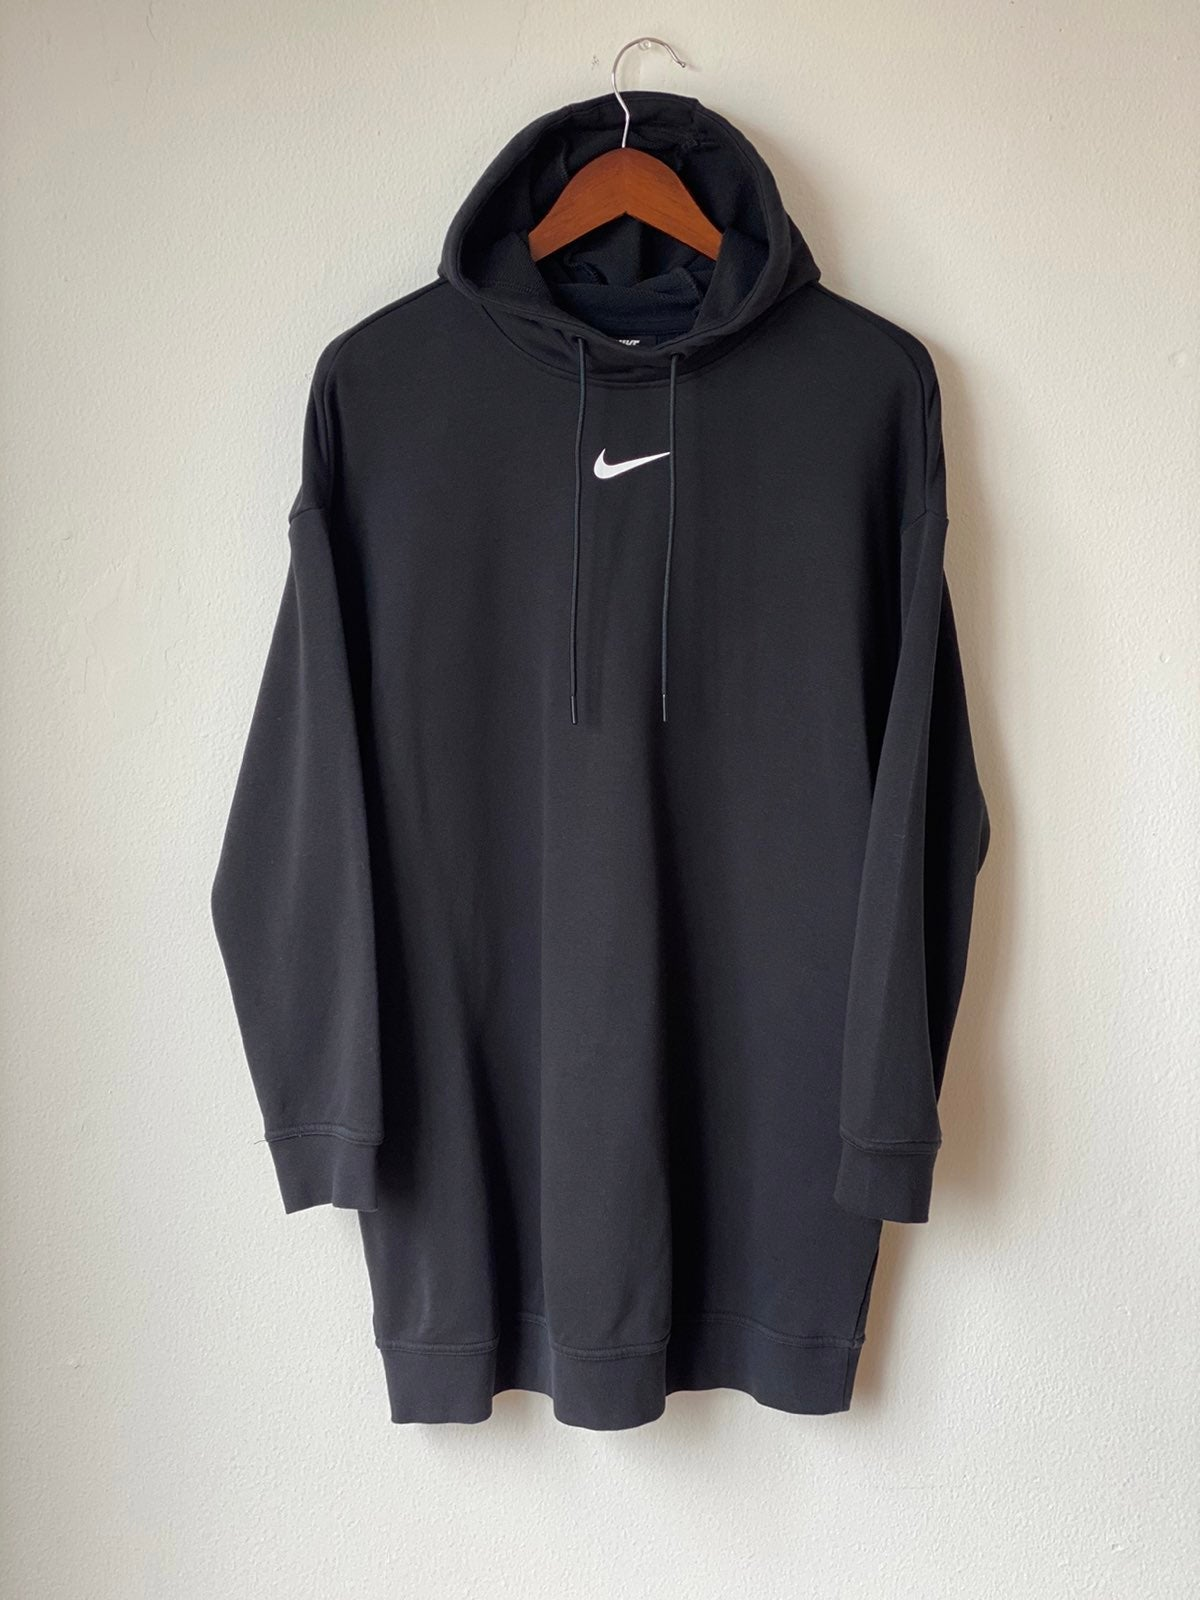 Womens Nike Hoodie Dress Sz S